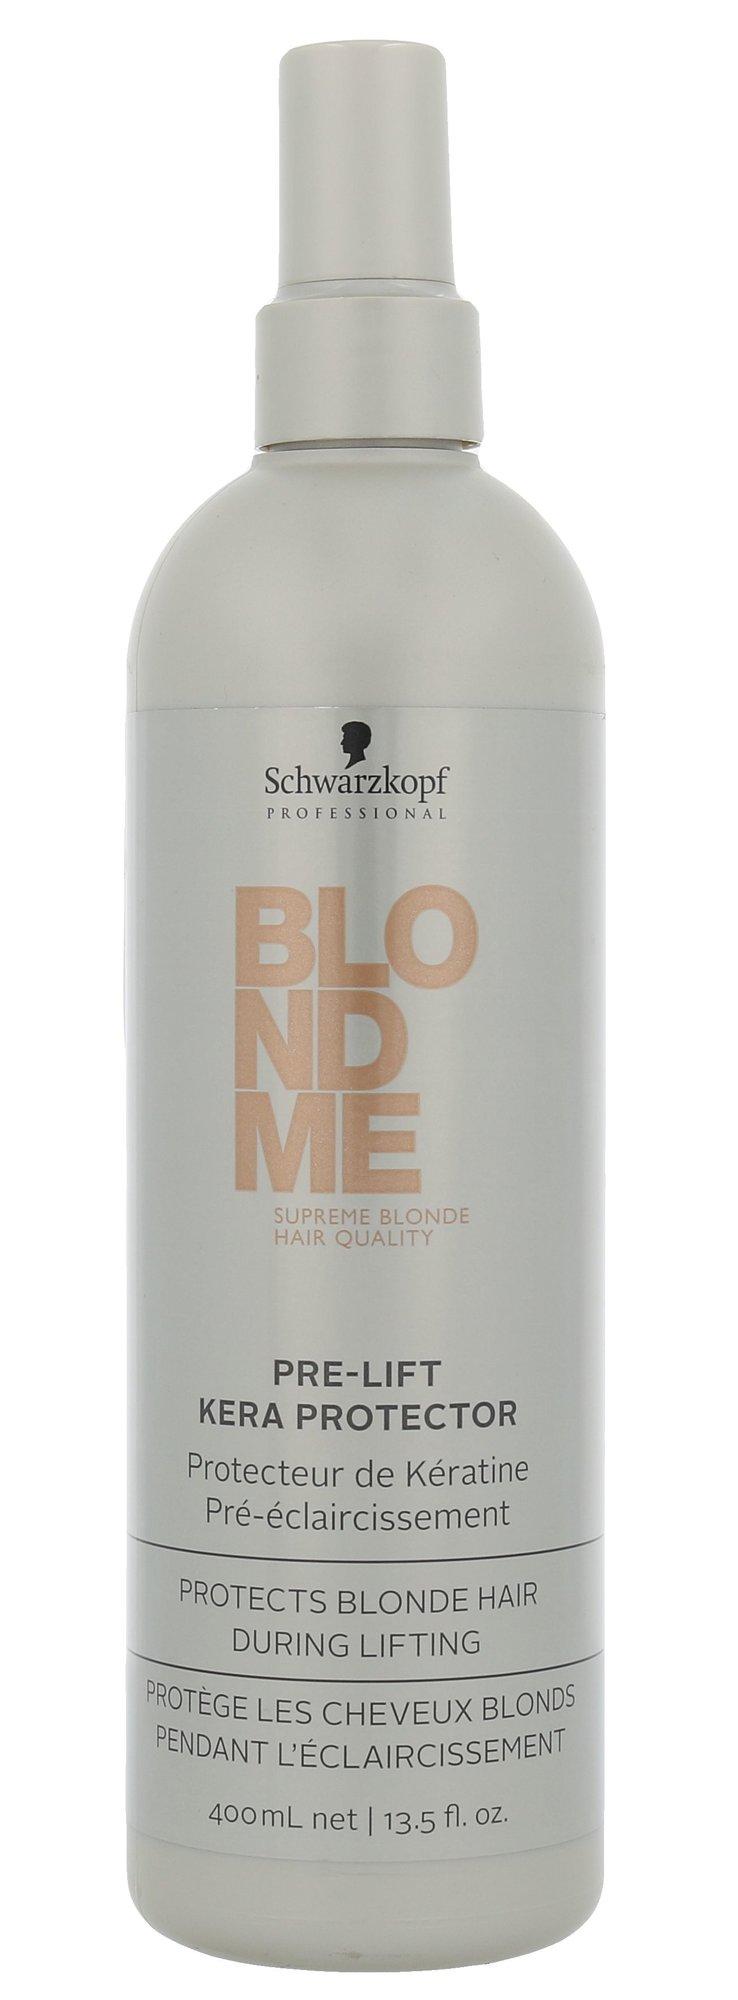 Schwarzkopf Blond Me Cosmetic 400ml